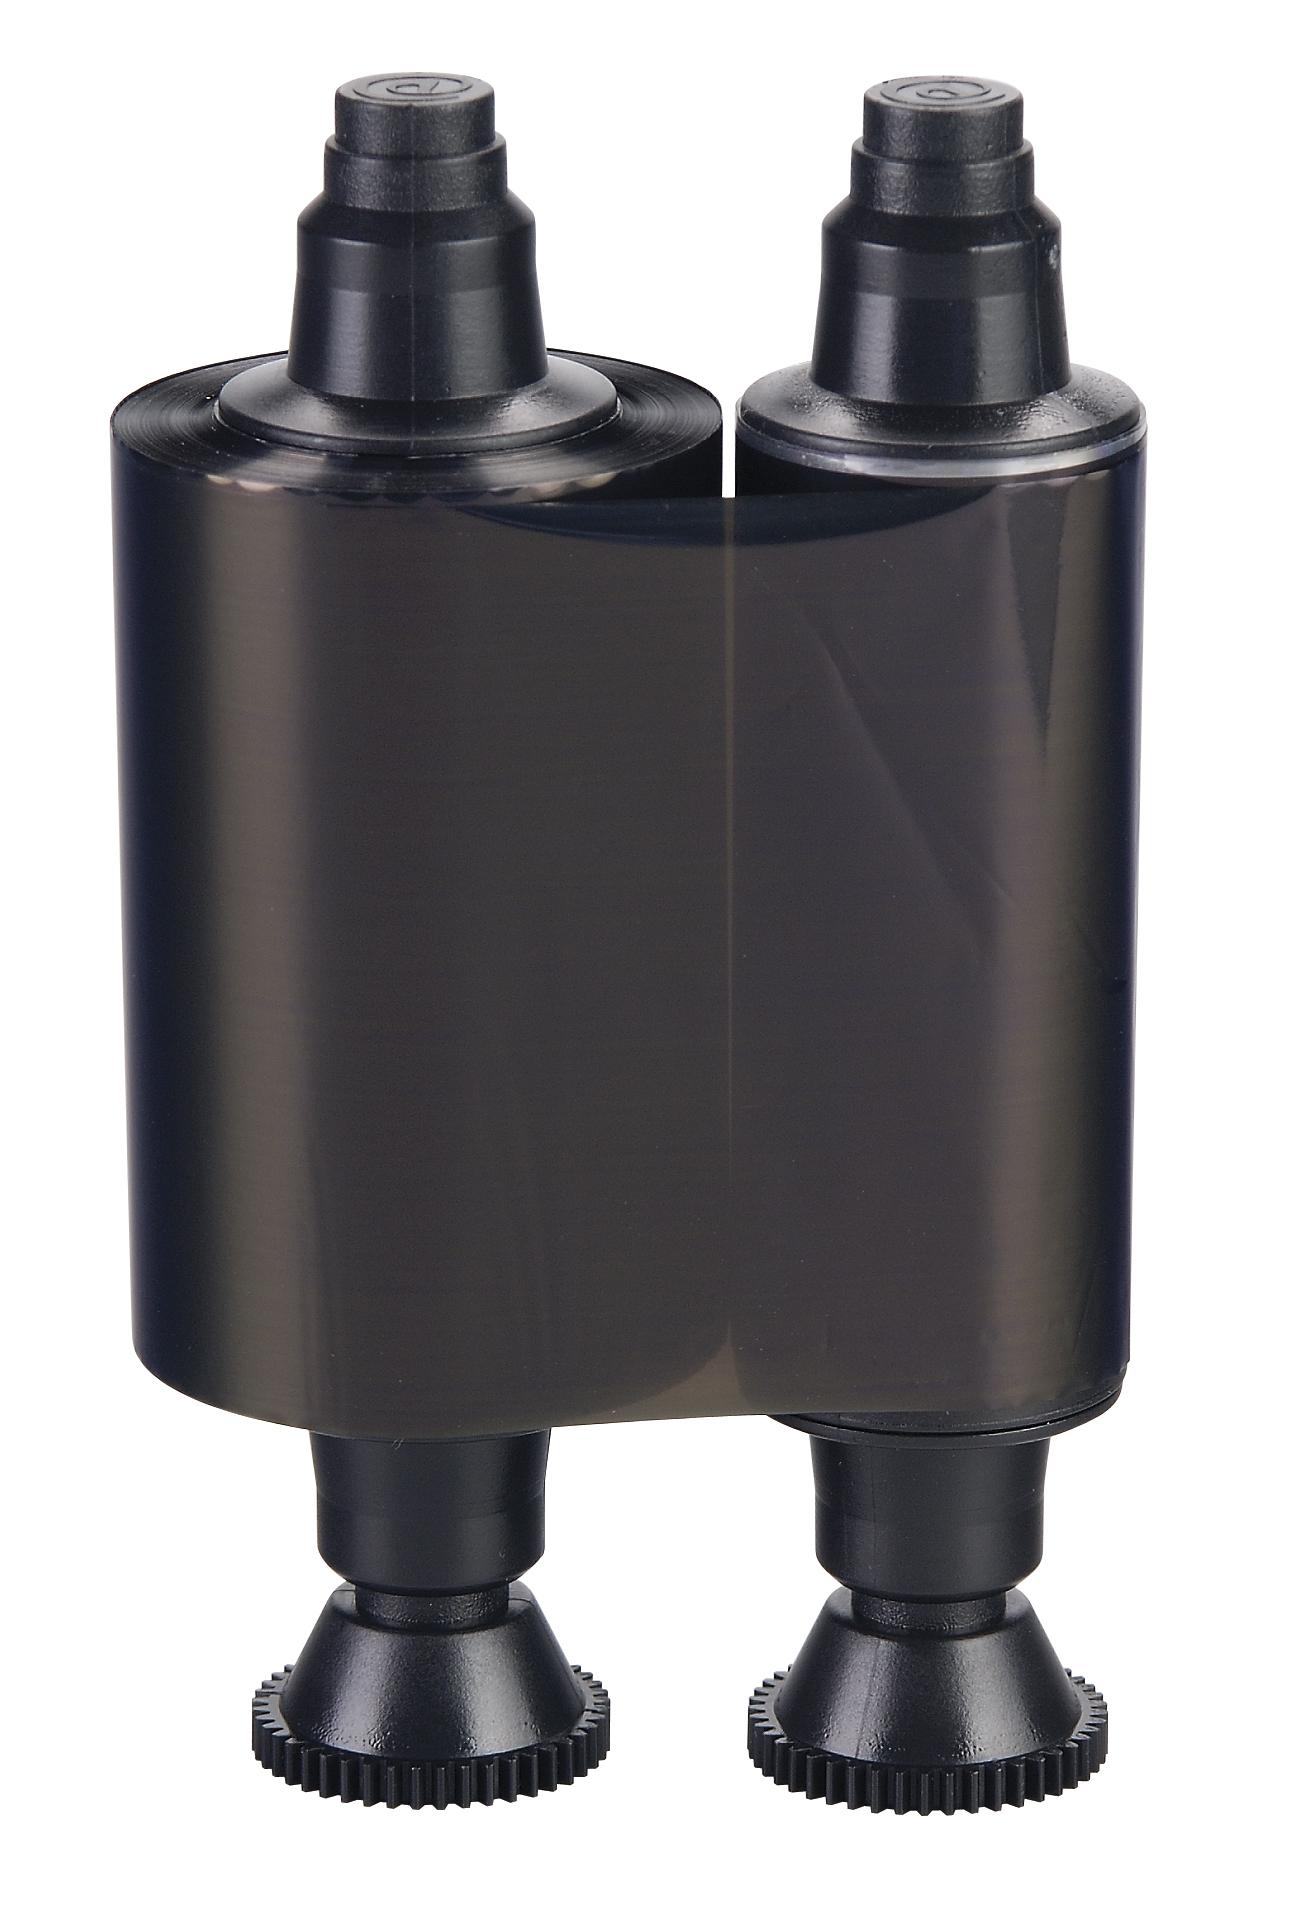 Evolis R2211 Farbband schwarz für TATTOO + TATTOO2